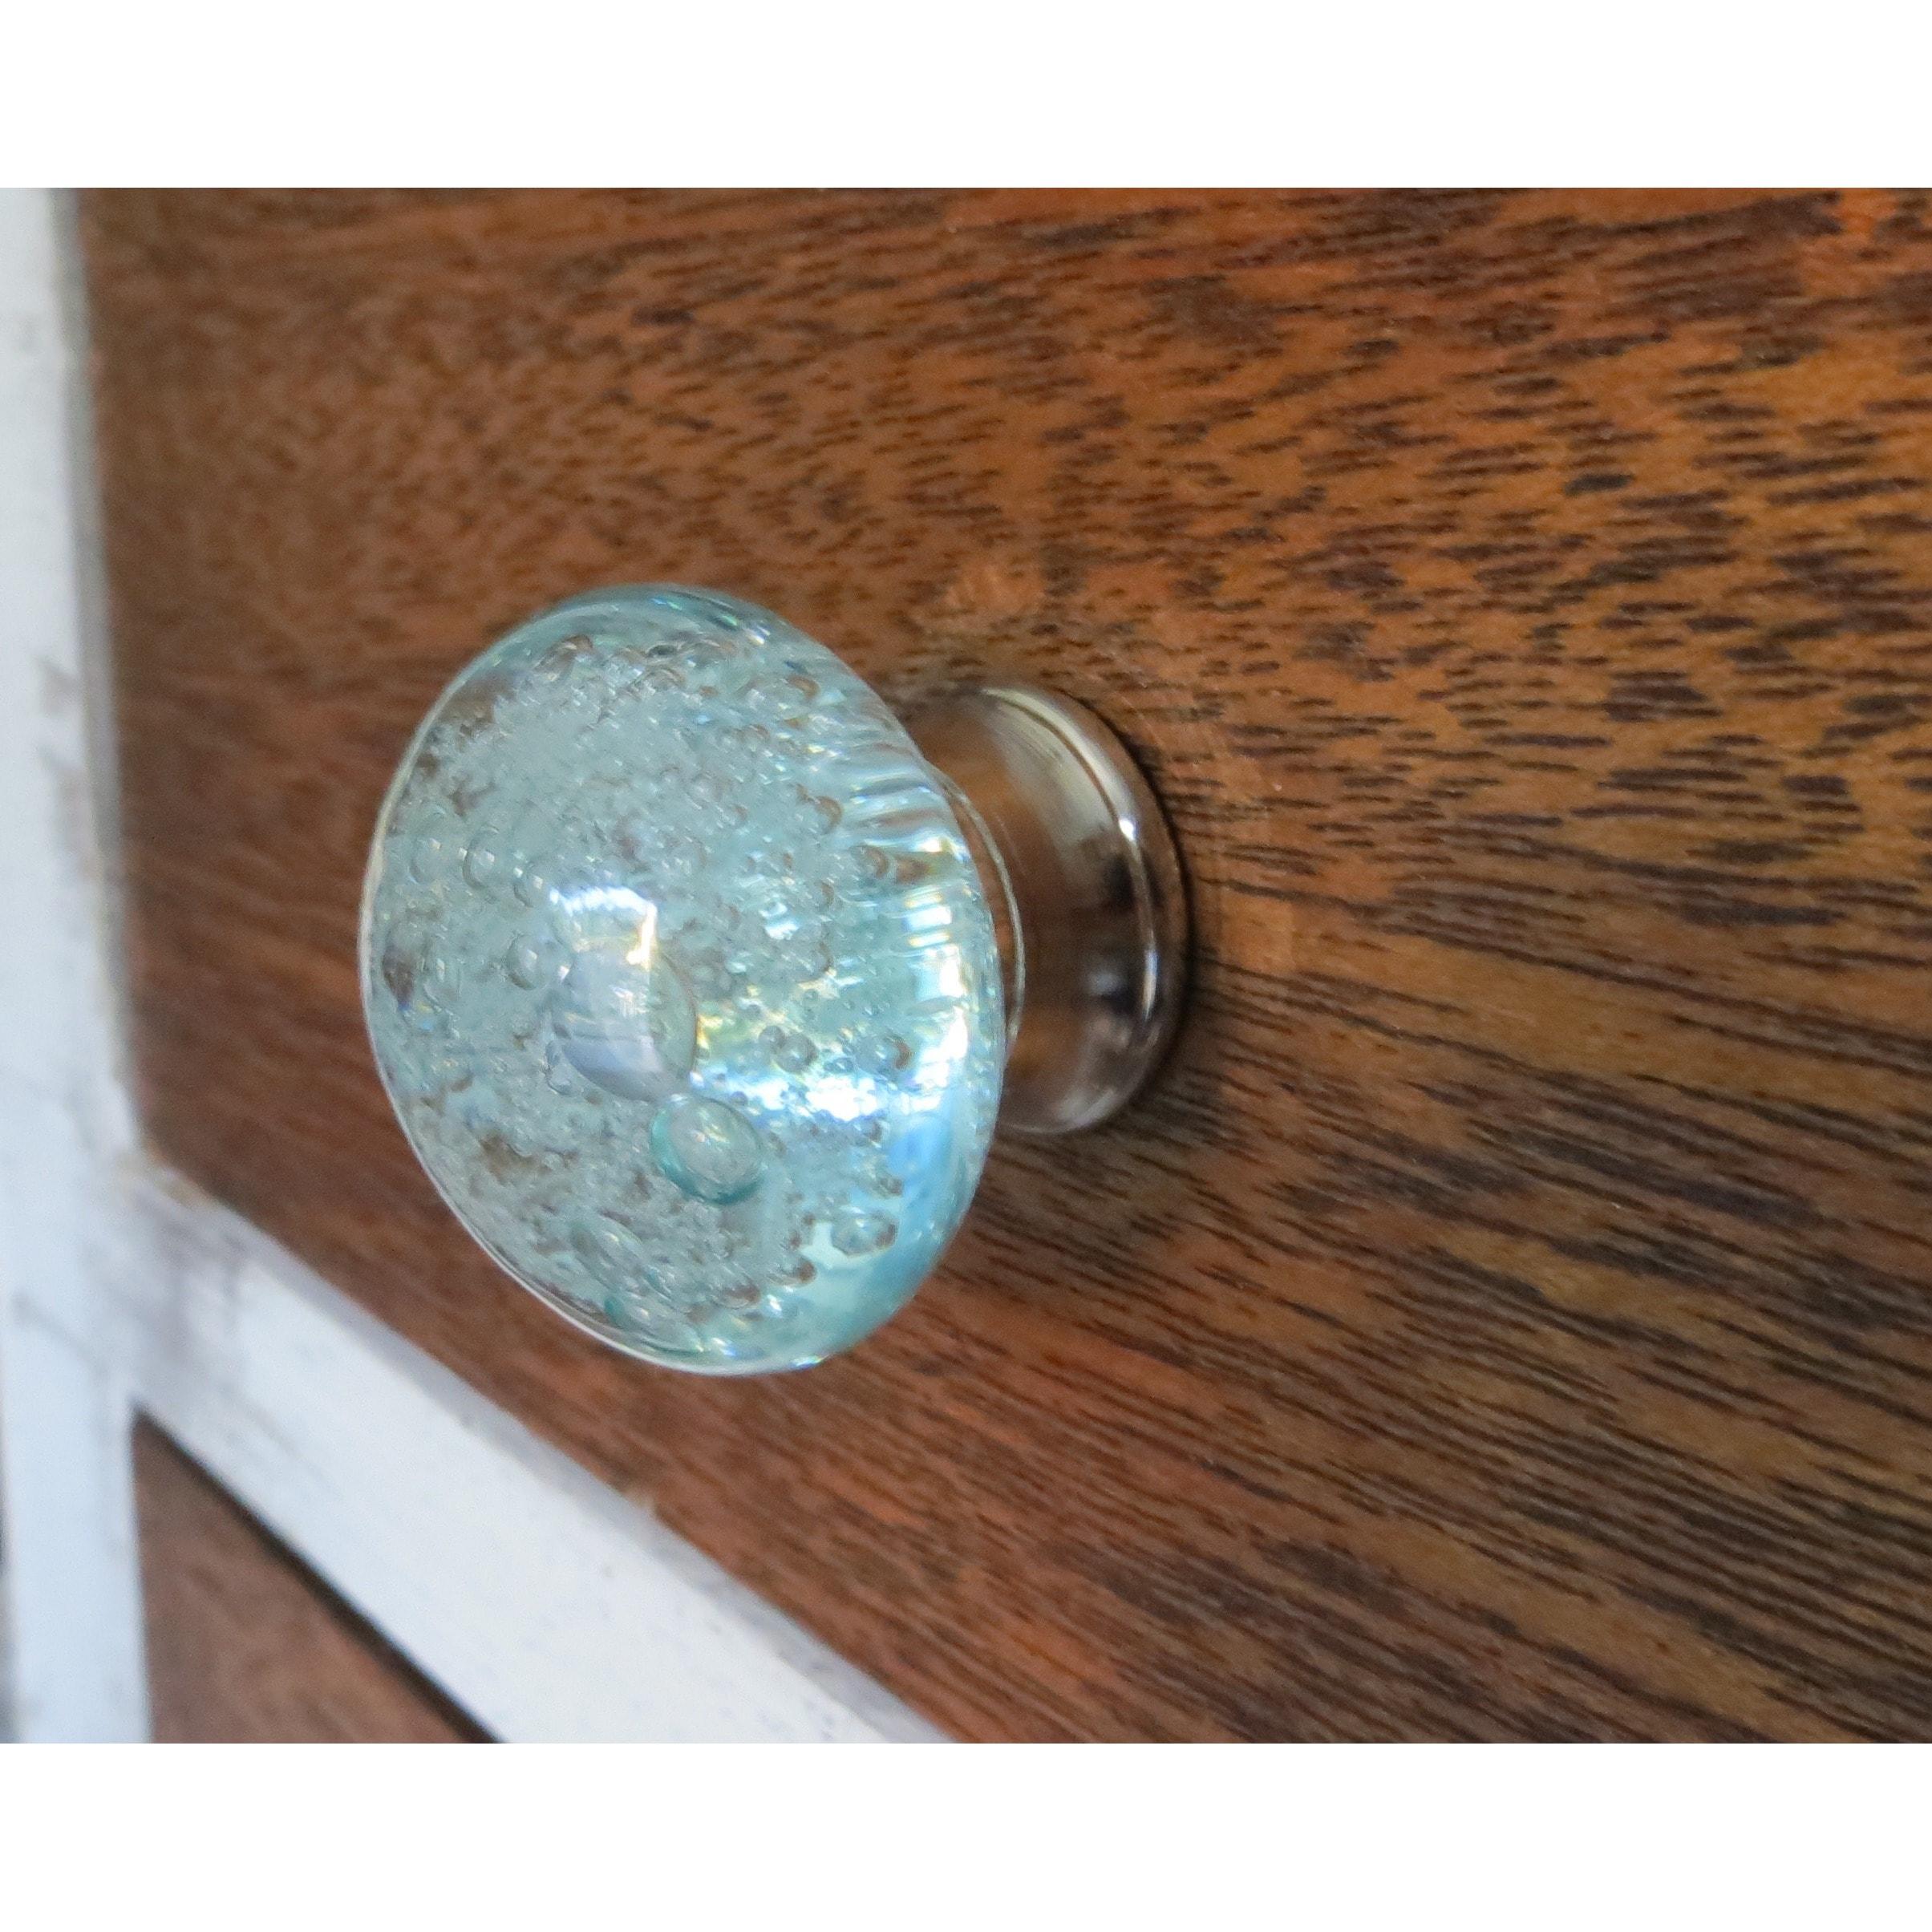 Aqua Blue Bubbles Glass Drawer/ Door/ Cabinet Pull Knob (Pack of 6)